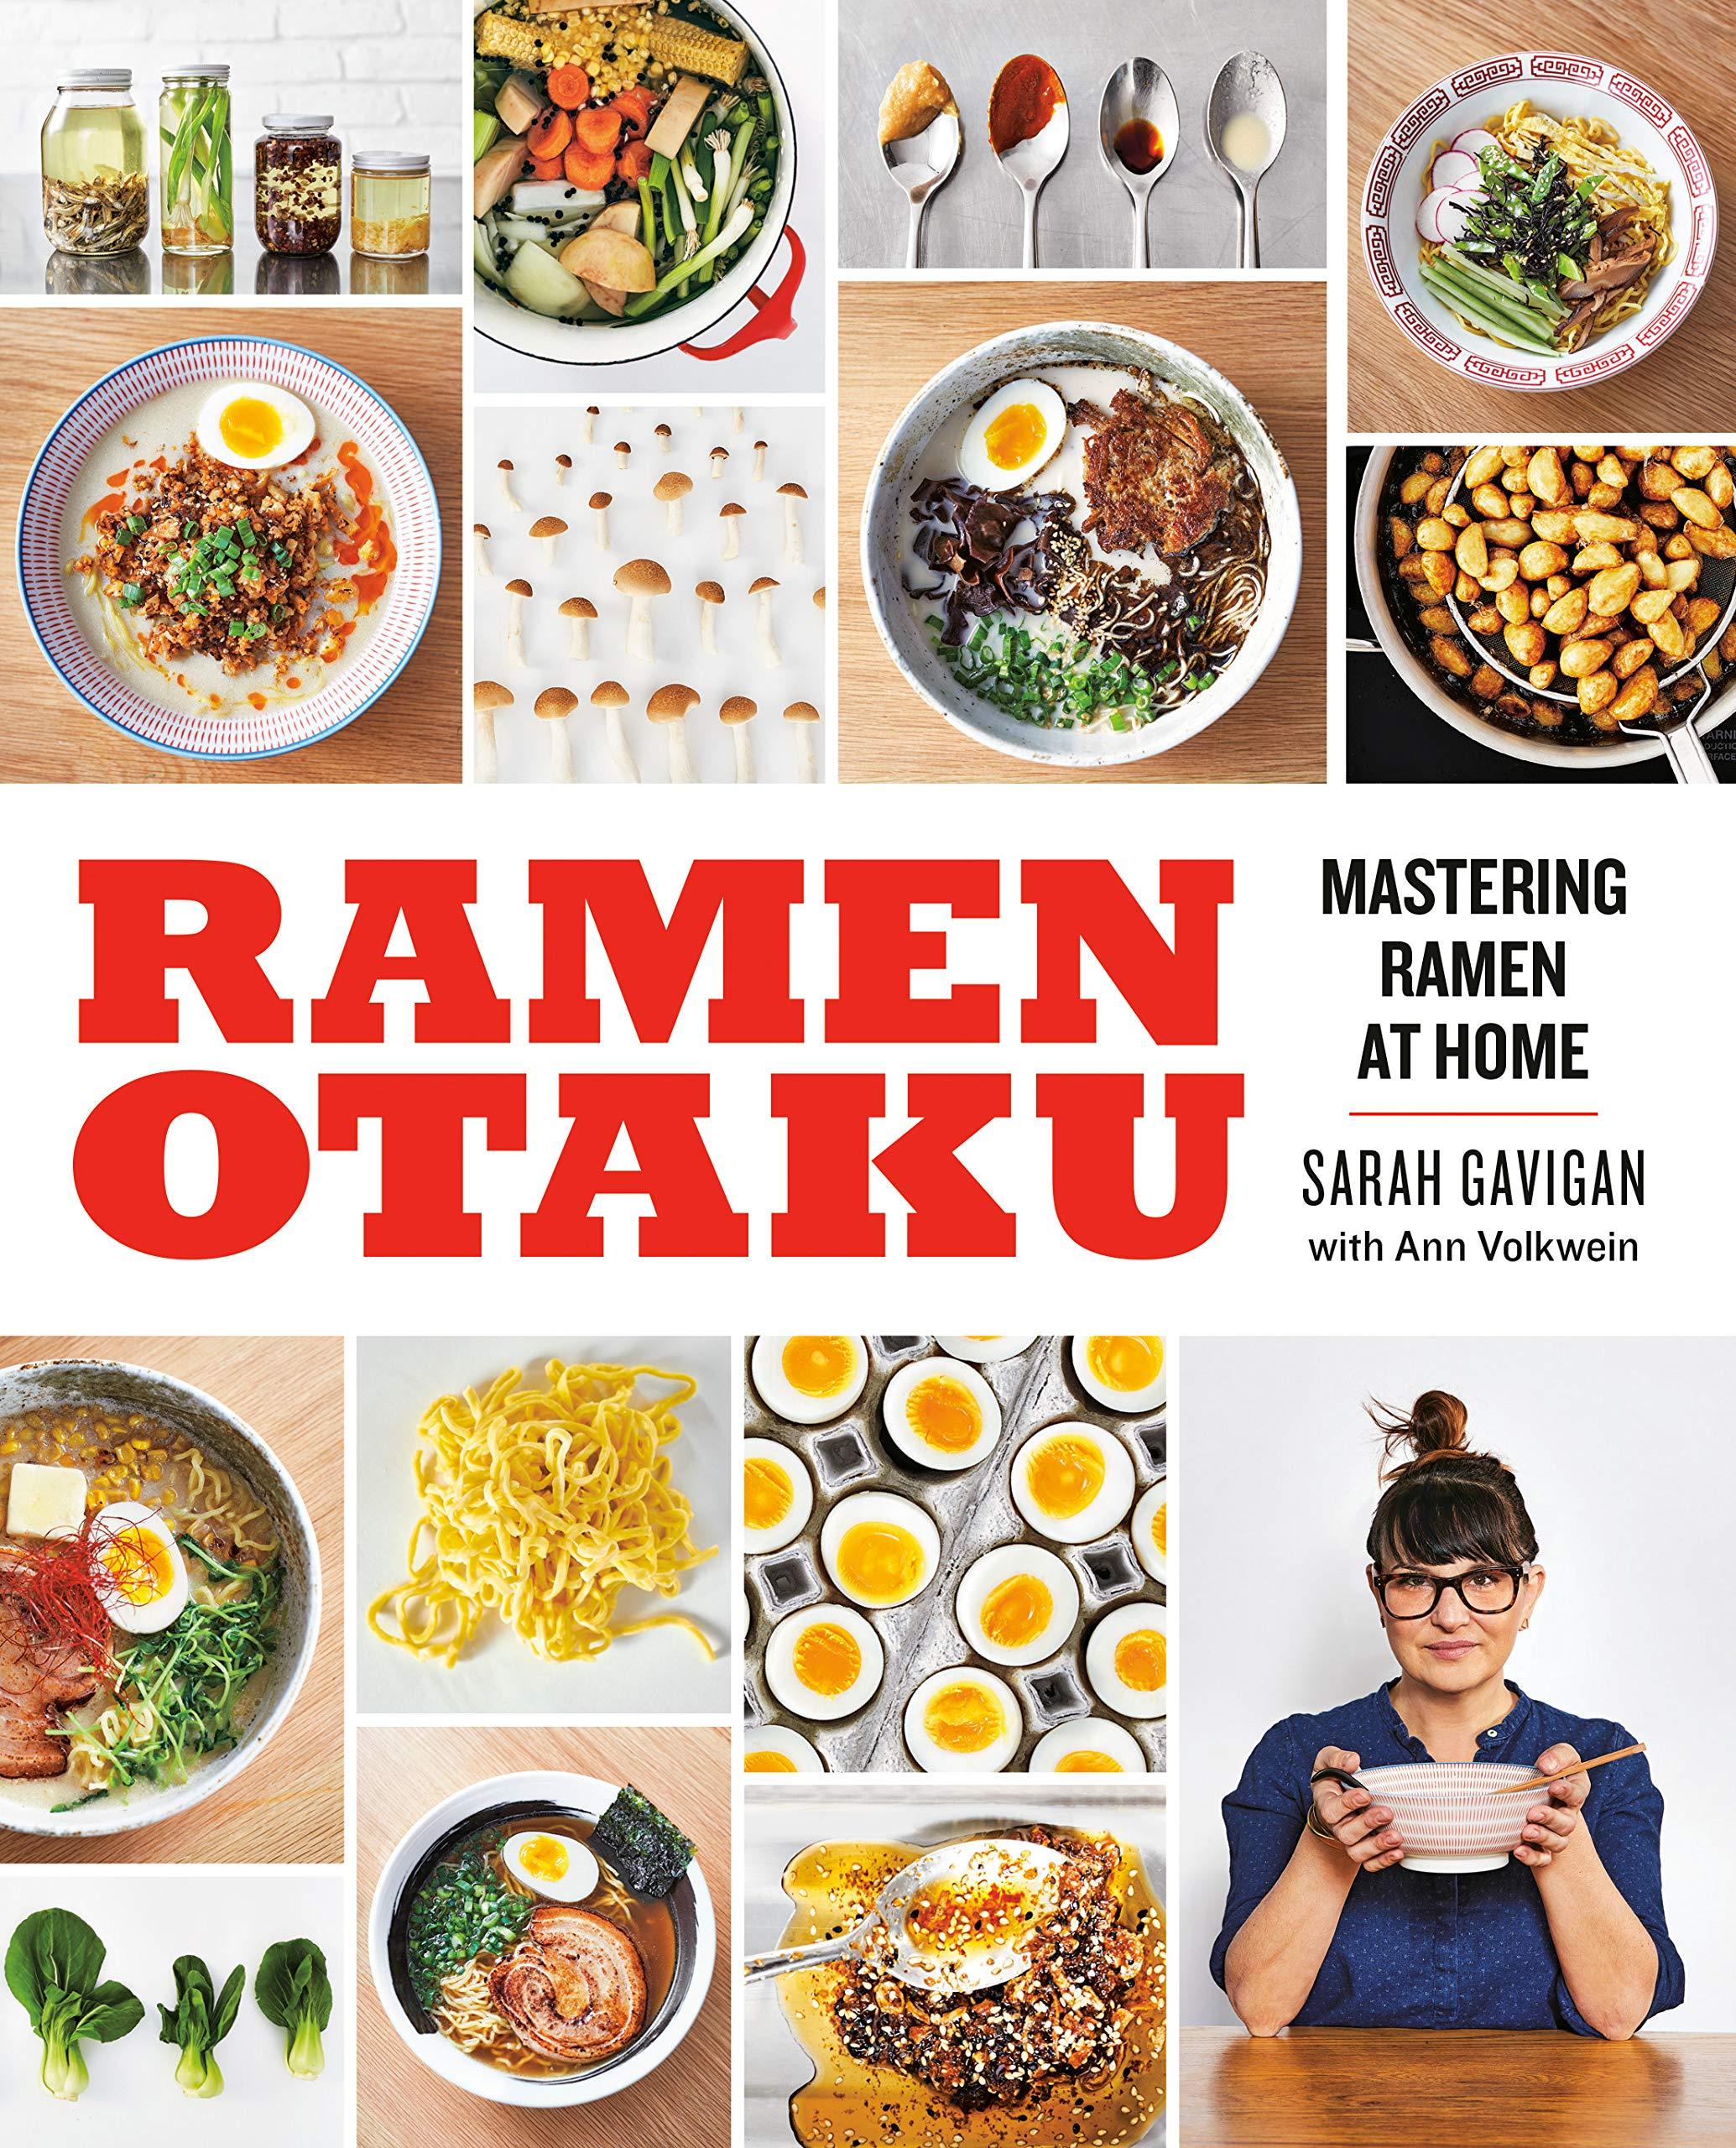 Ramen Otaku Mastering Home product image